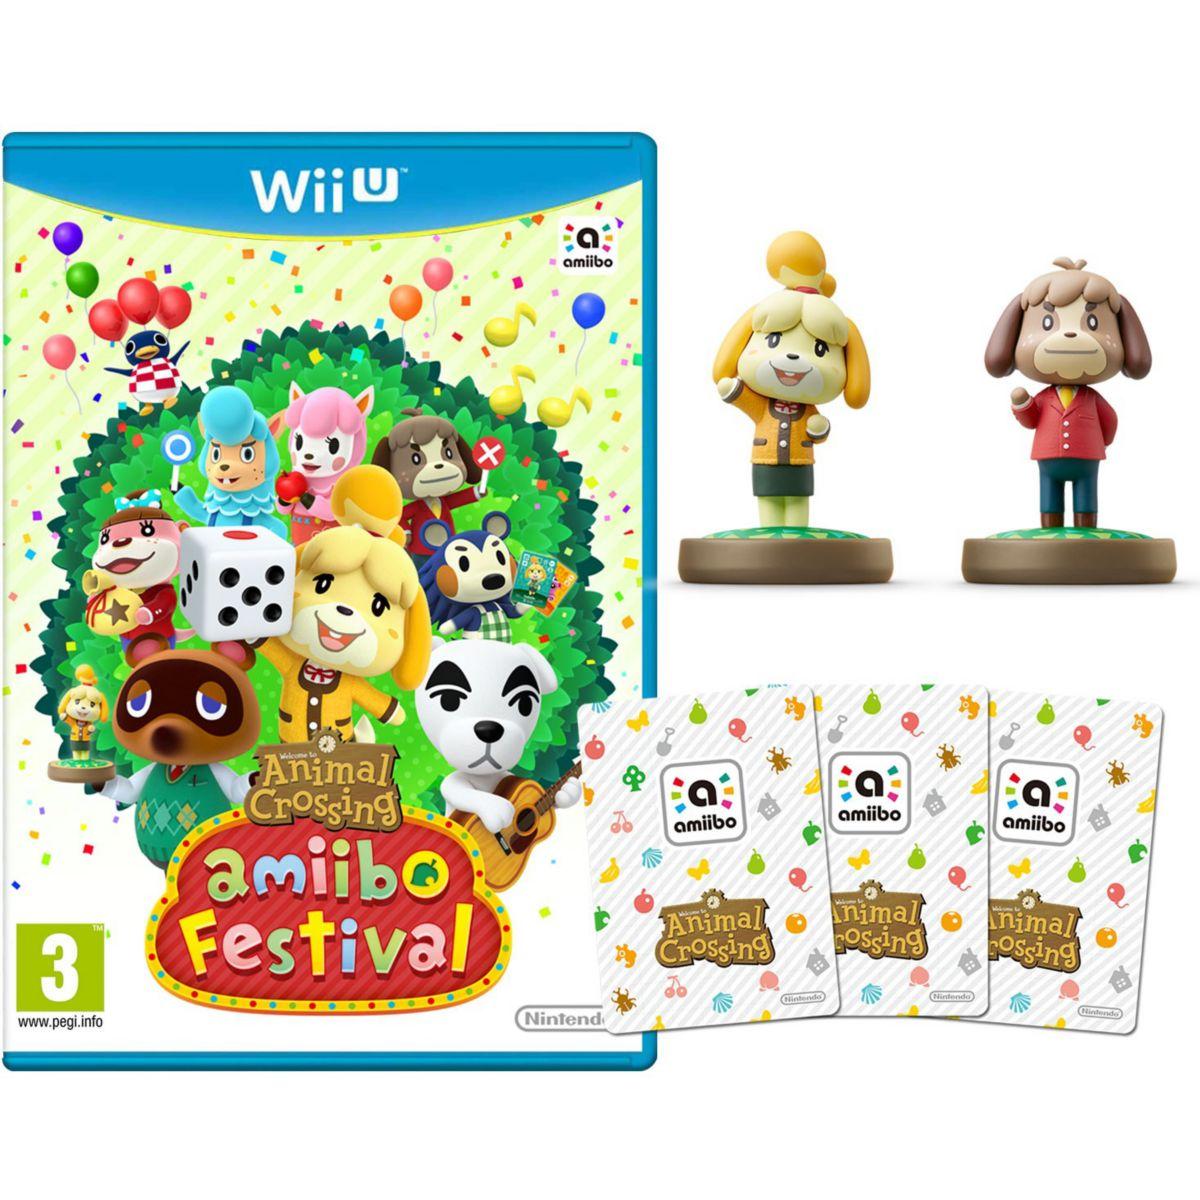 Jeu wii u nintendo animal crossing amiibo festival 2 figurines 3 cartes soldes et bonnes affaires à prix imbattables